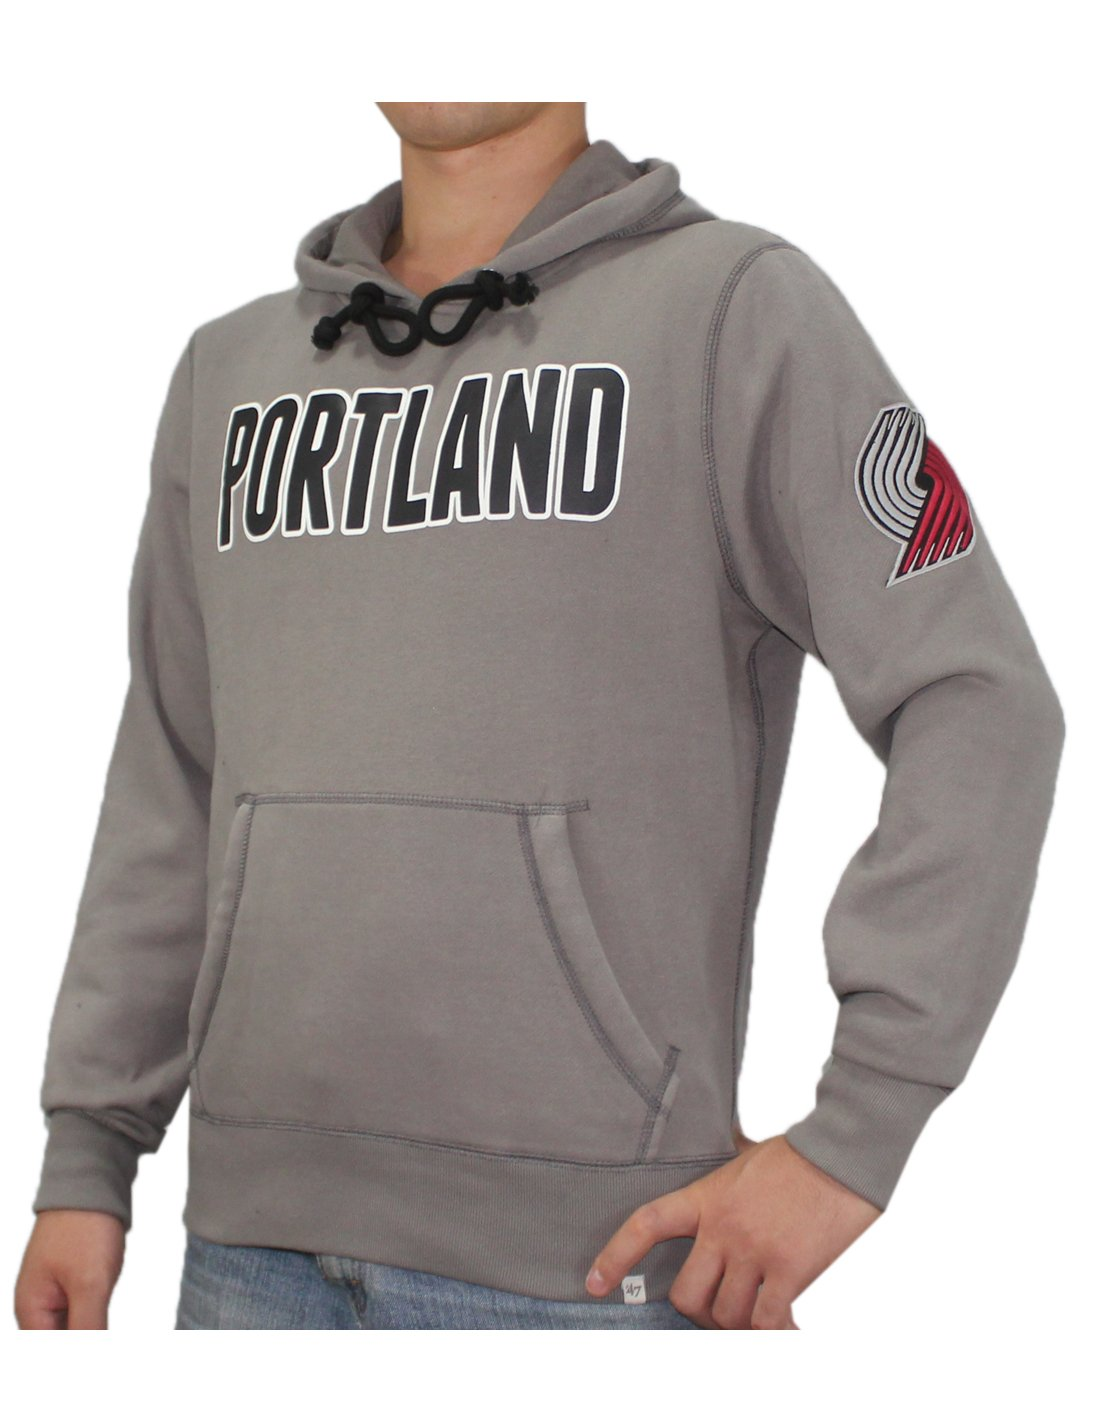 NBA Mens PORTLAND TRAIL BLAZERS: Athletic Pullover Hoodie / Sweatshirt S Grey